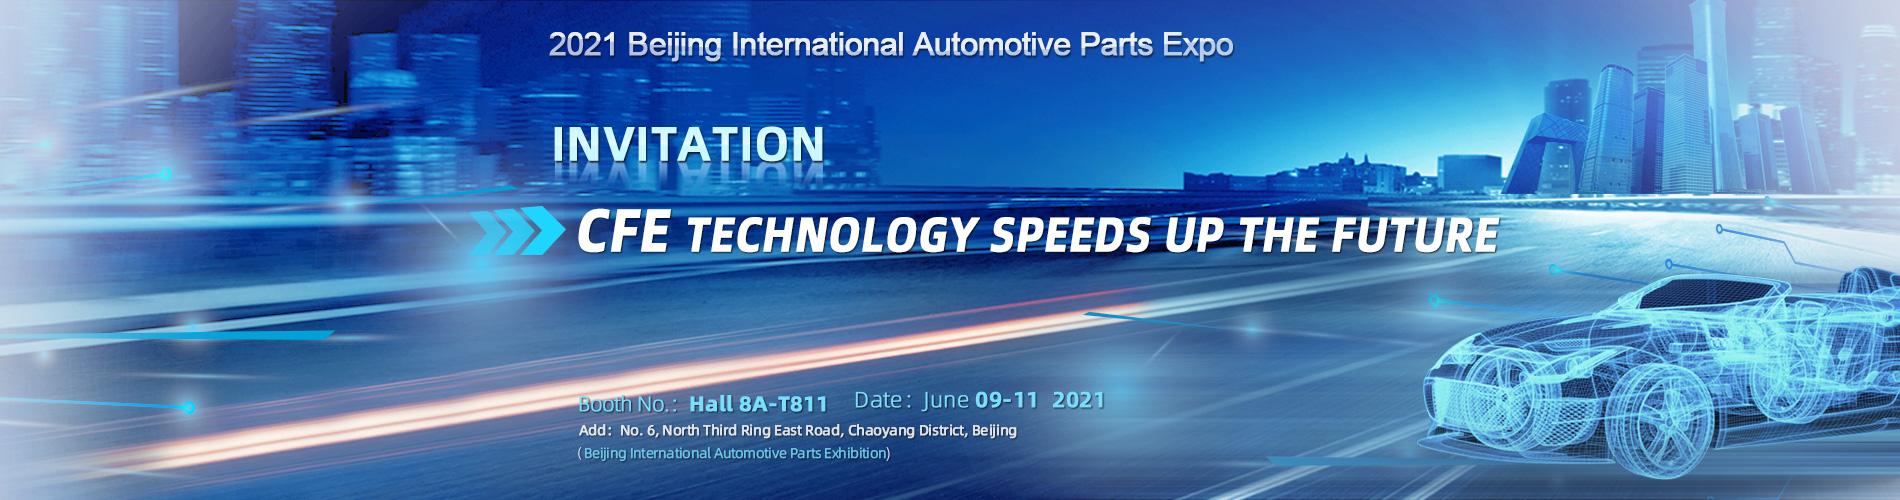 CFE-2021 Beijing International Auto Parts Expo (CAPS) Invitation